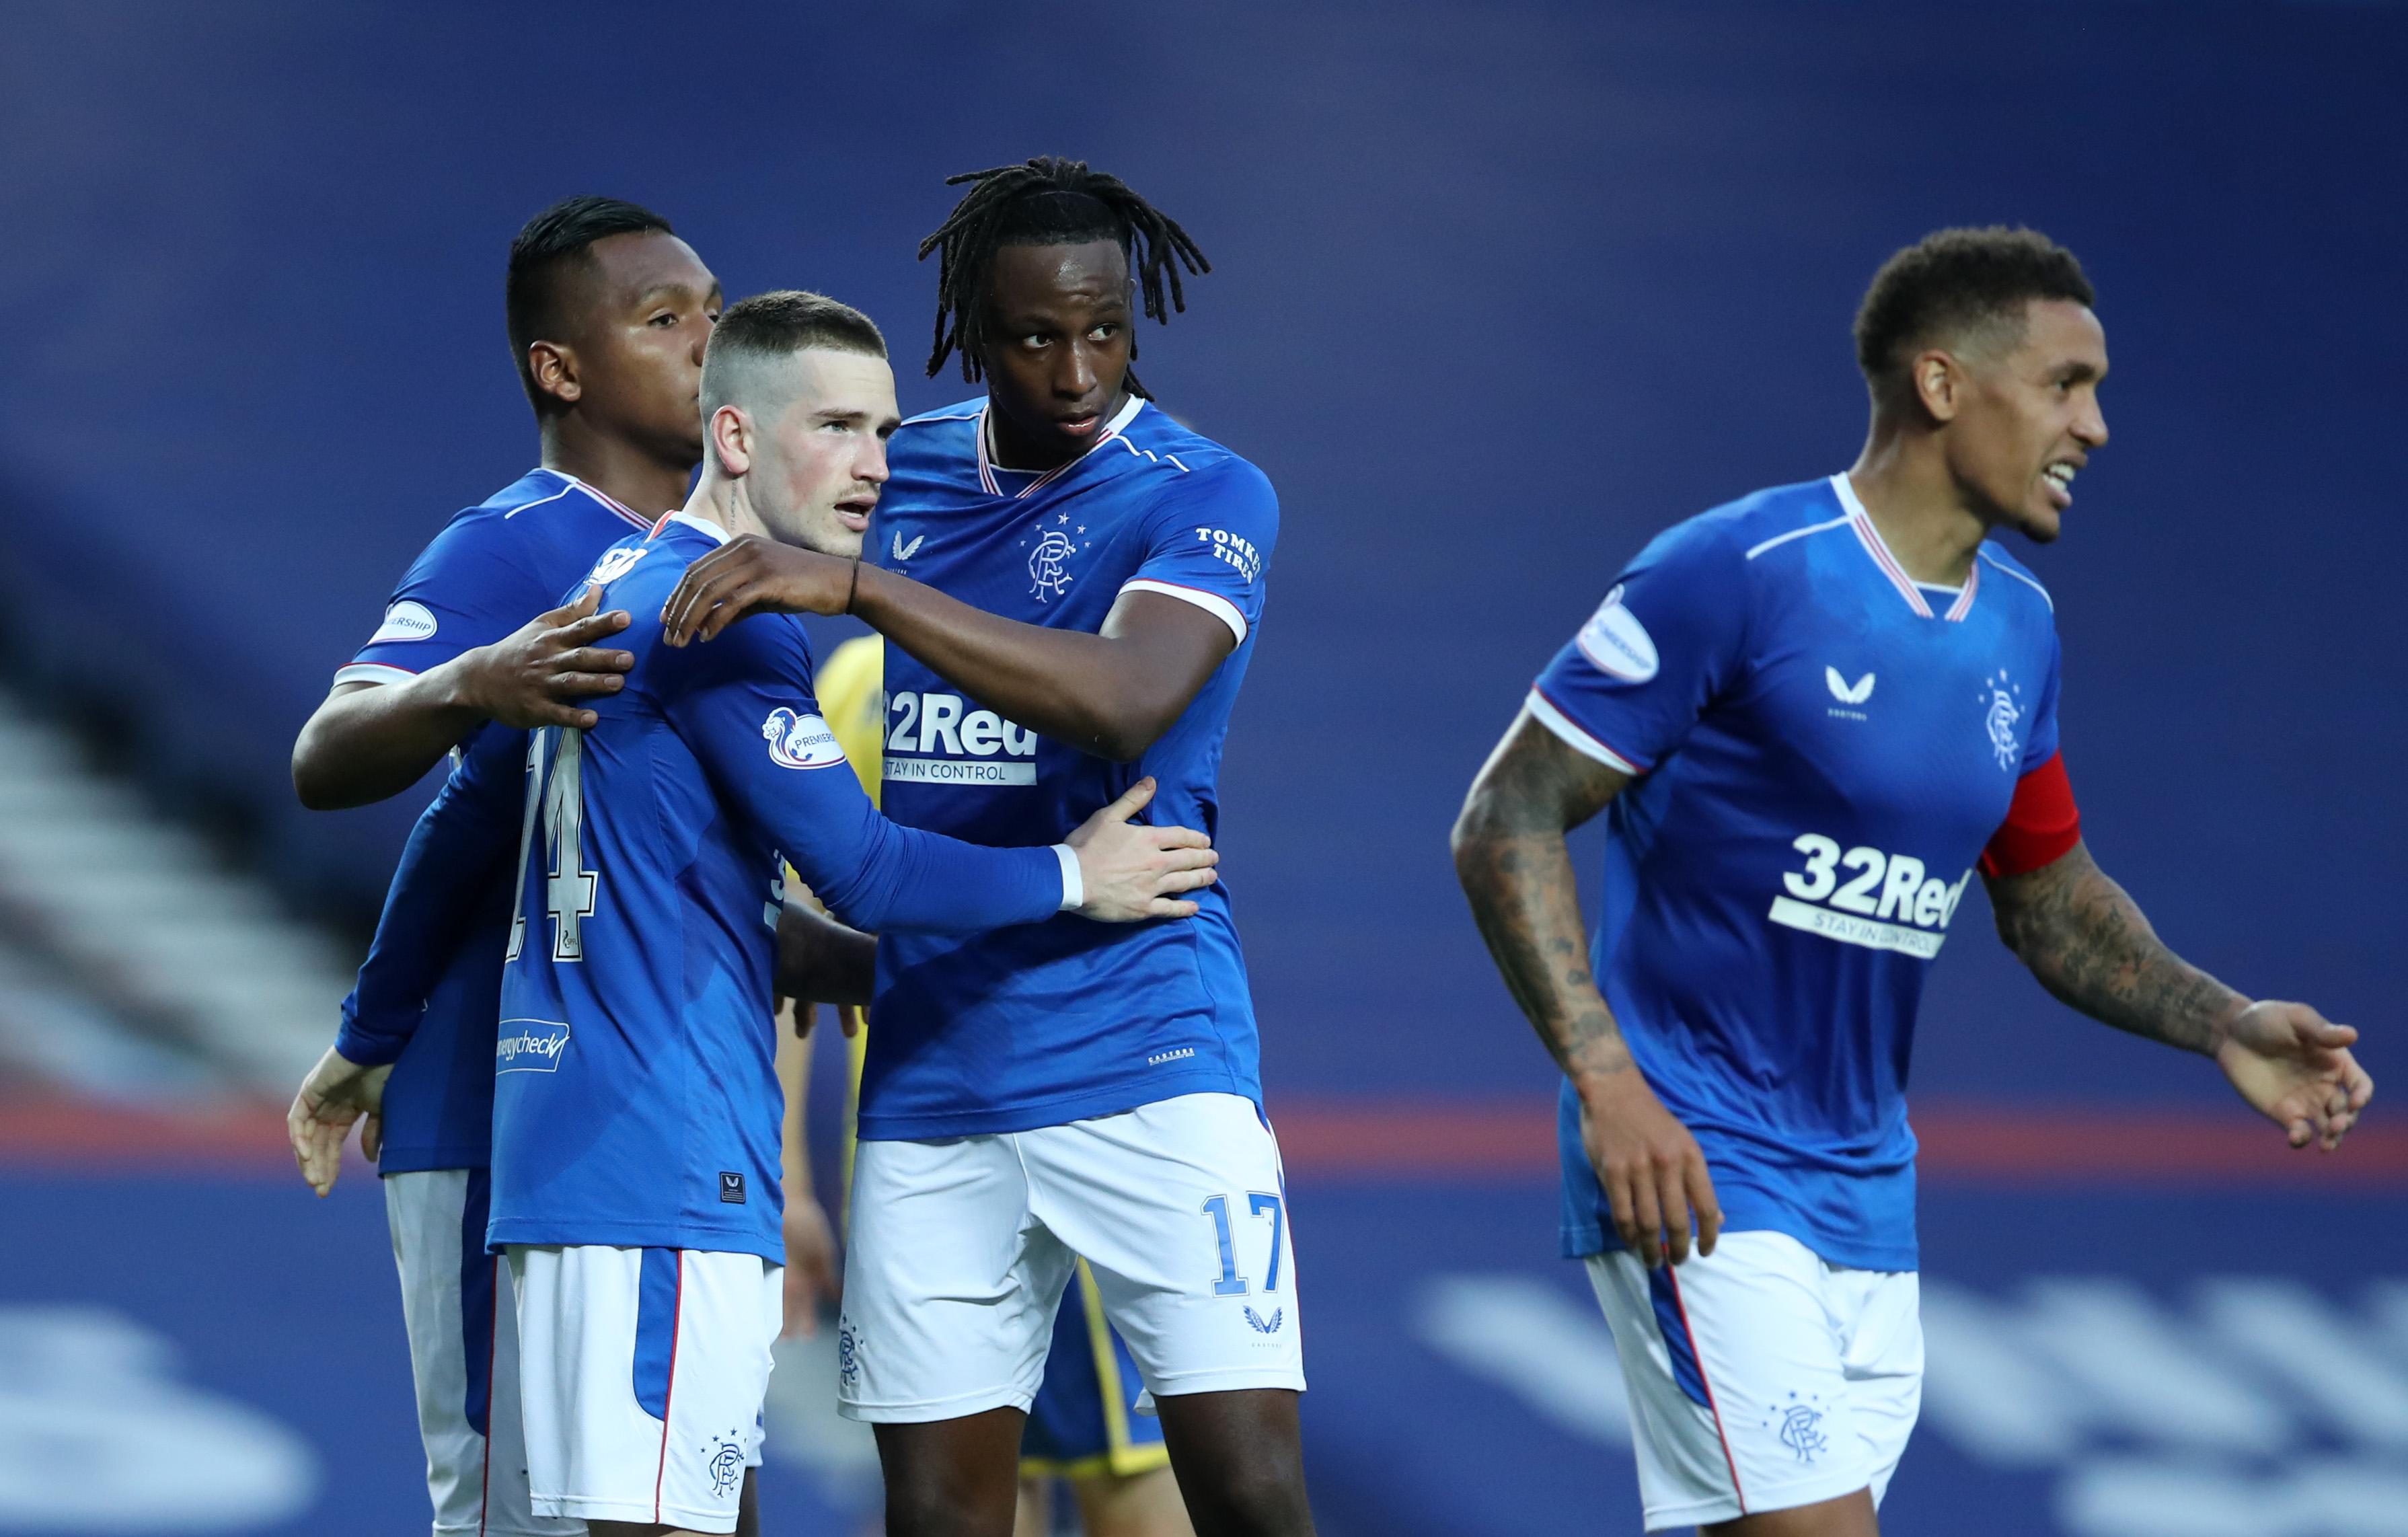 Rangers Vs Aberdeen Tactical Preview - Rangers celebrate